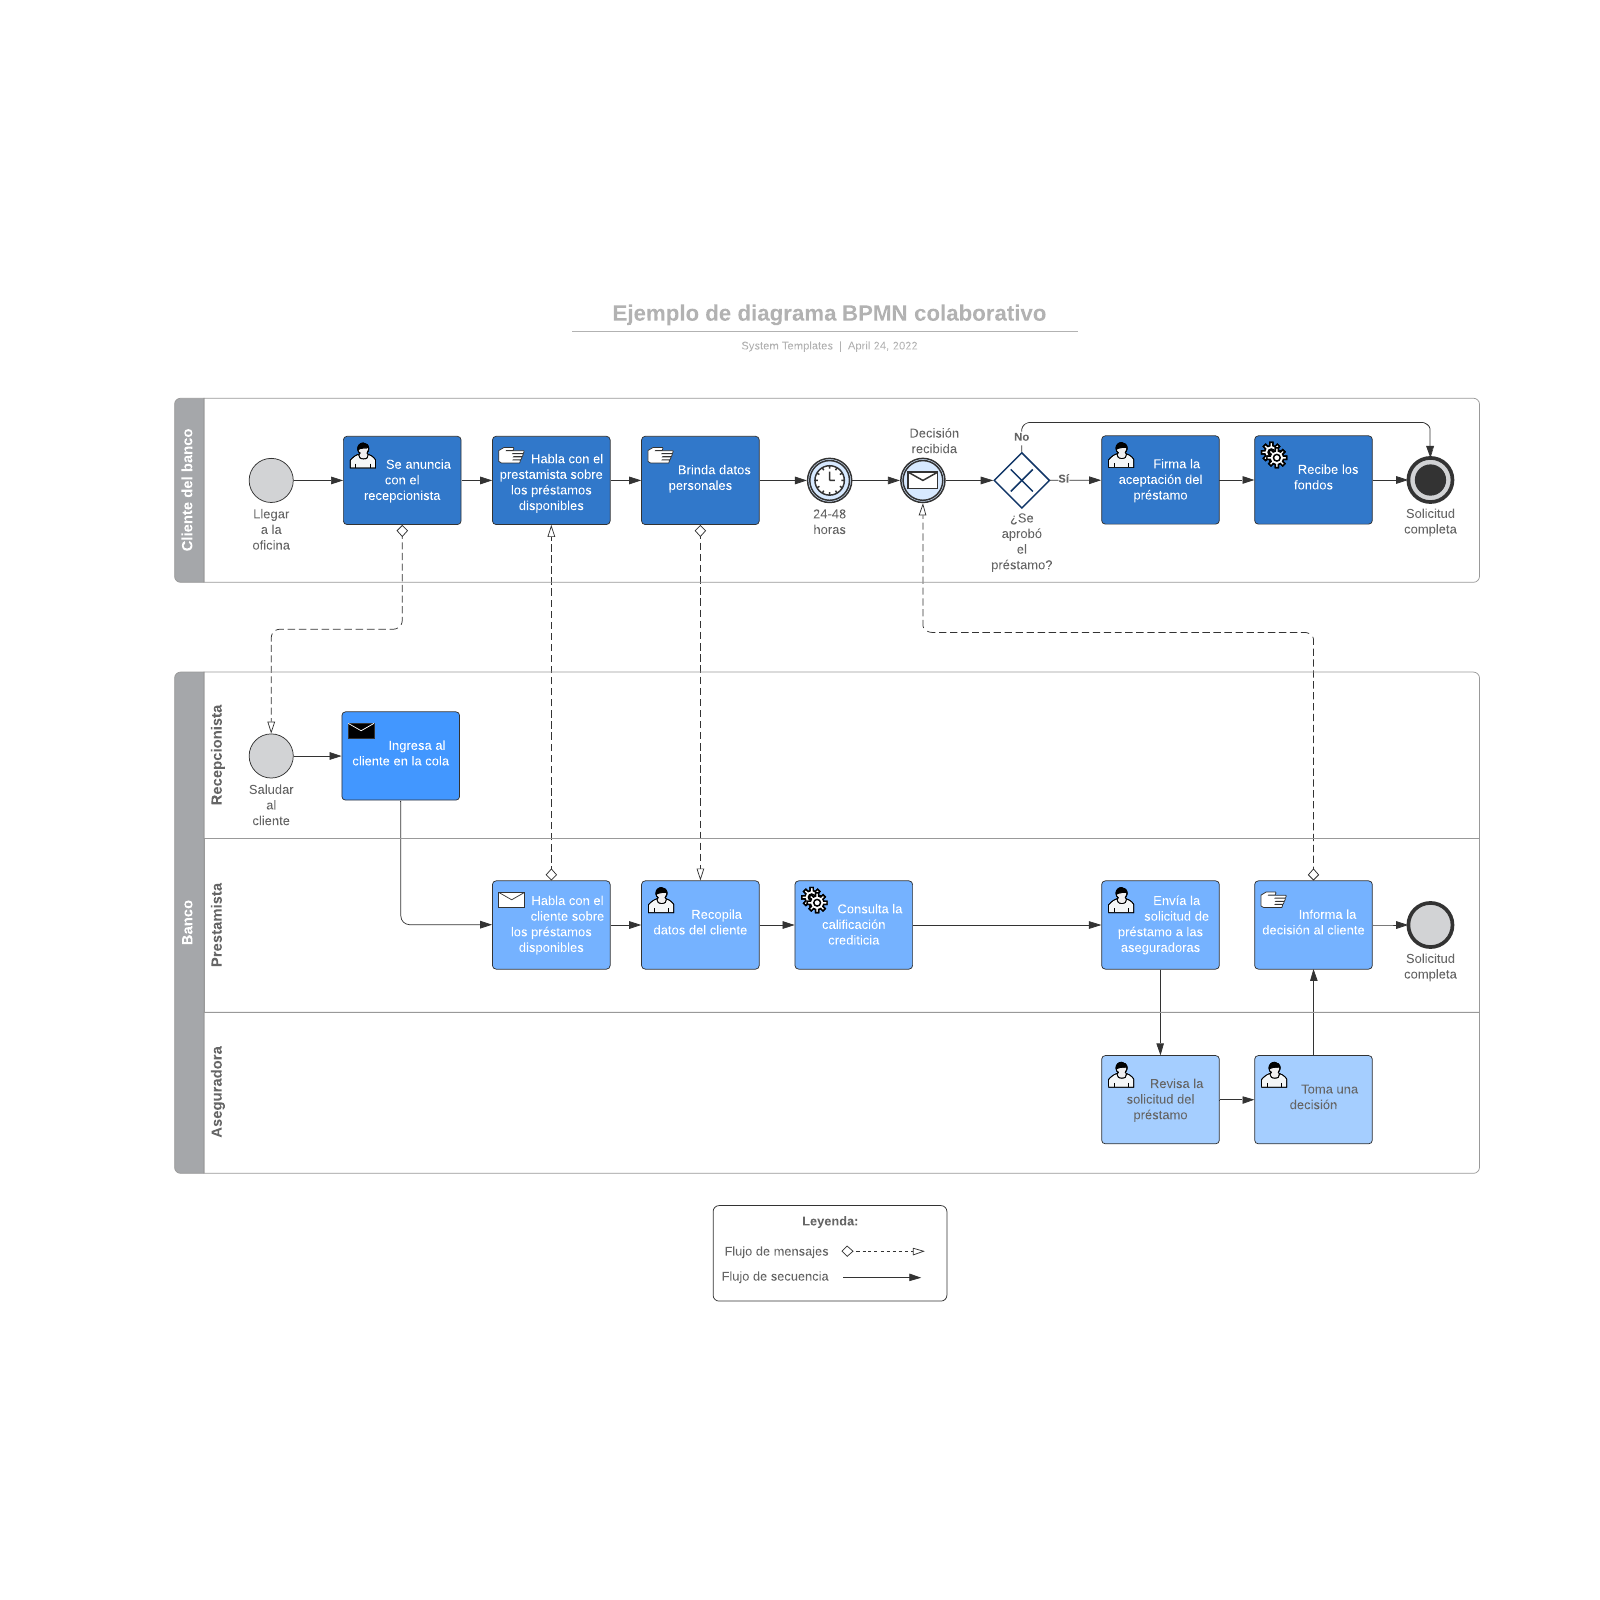 Ejemplo de diagrama BPMN colaborativo